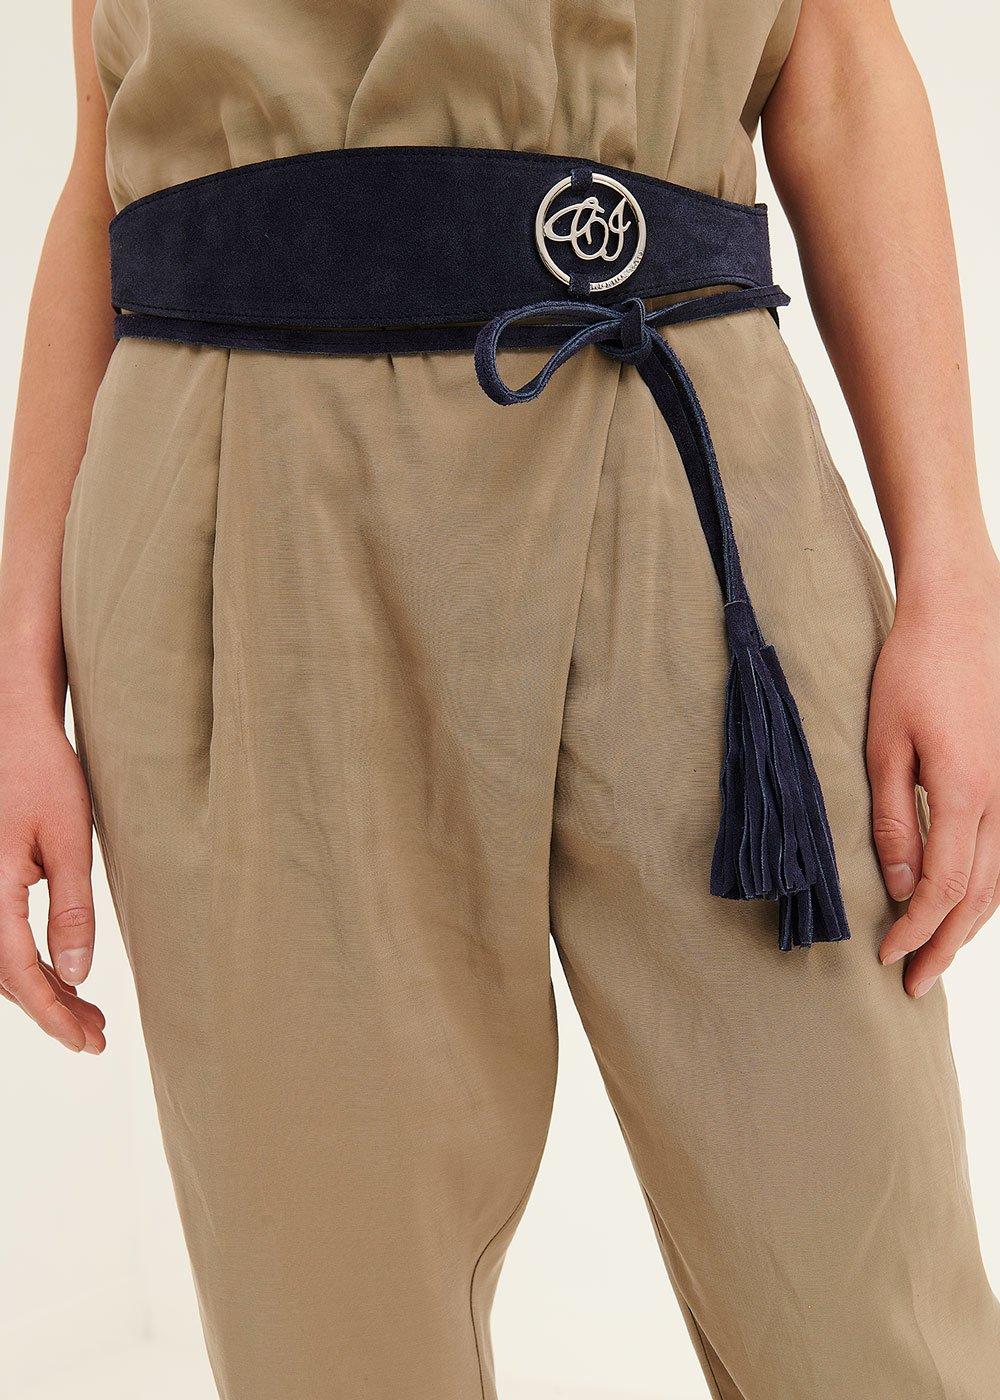 Carey suede belt - Medium Blue - Woman